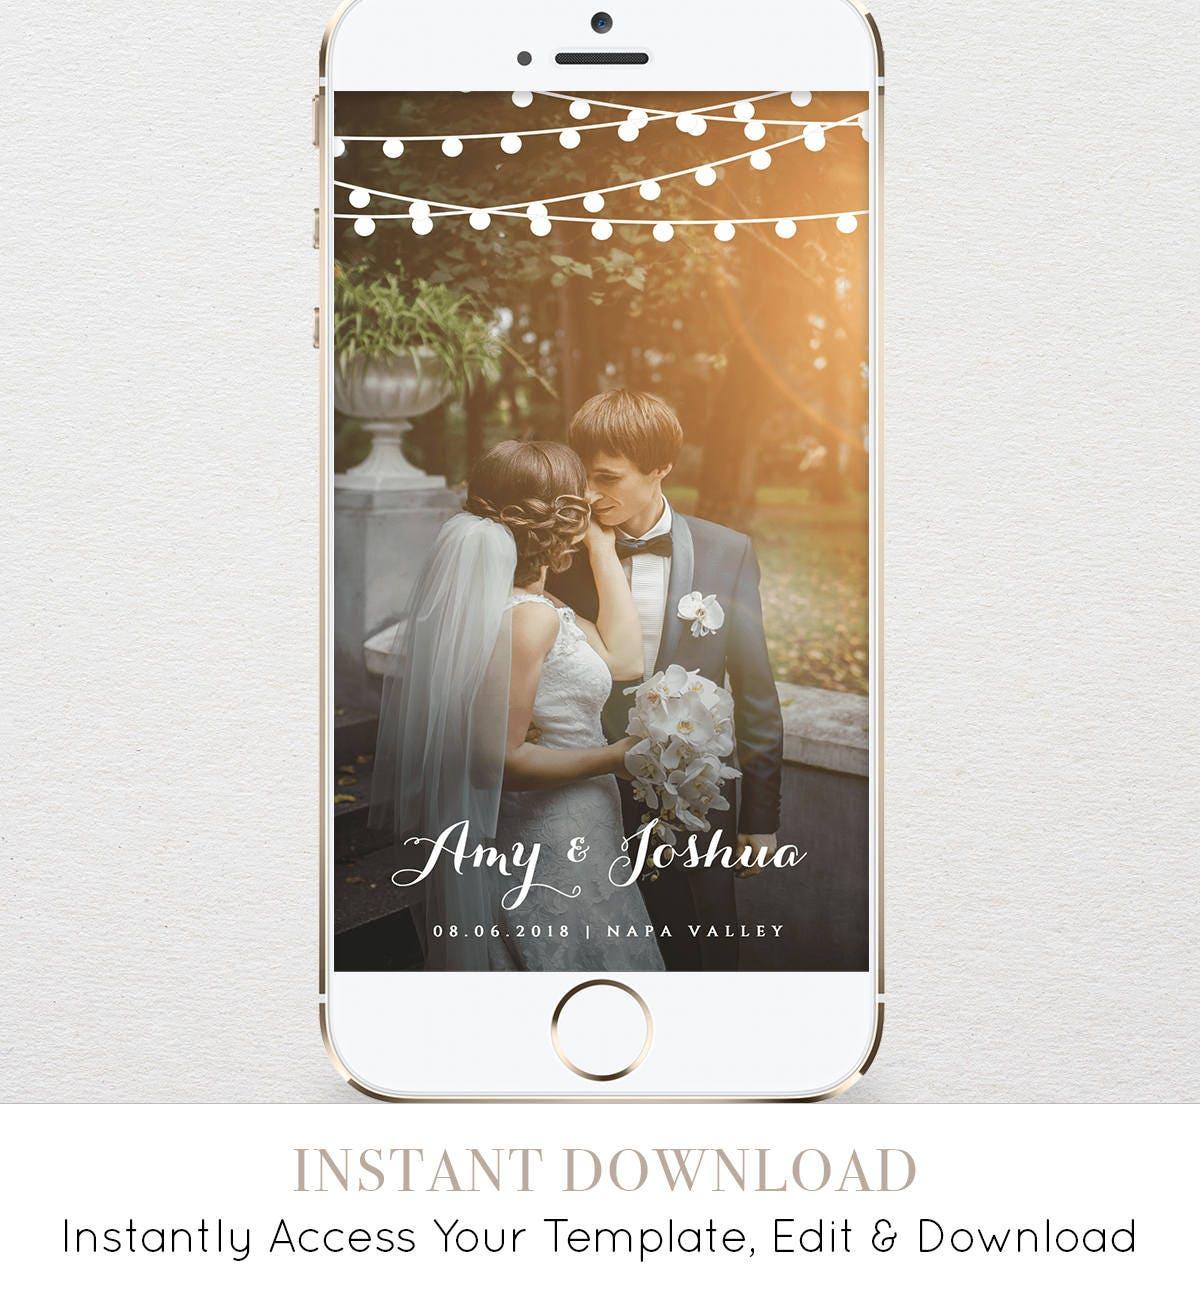 wedding geofilter snapchat filter instant download string lights 100 editable template. Black Bedroom Furniture Sets. Home Design Ideas